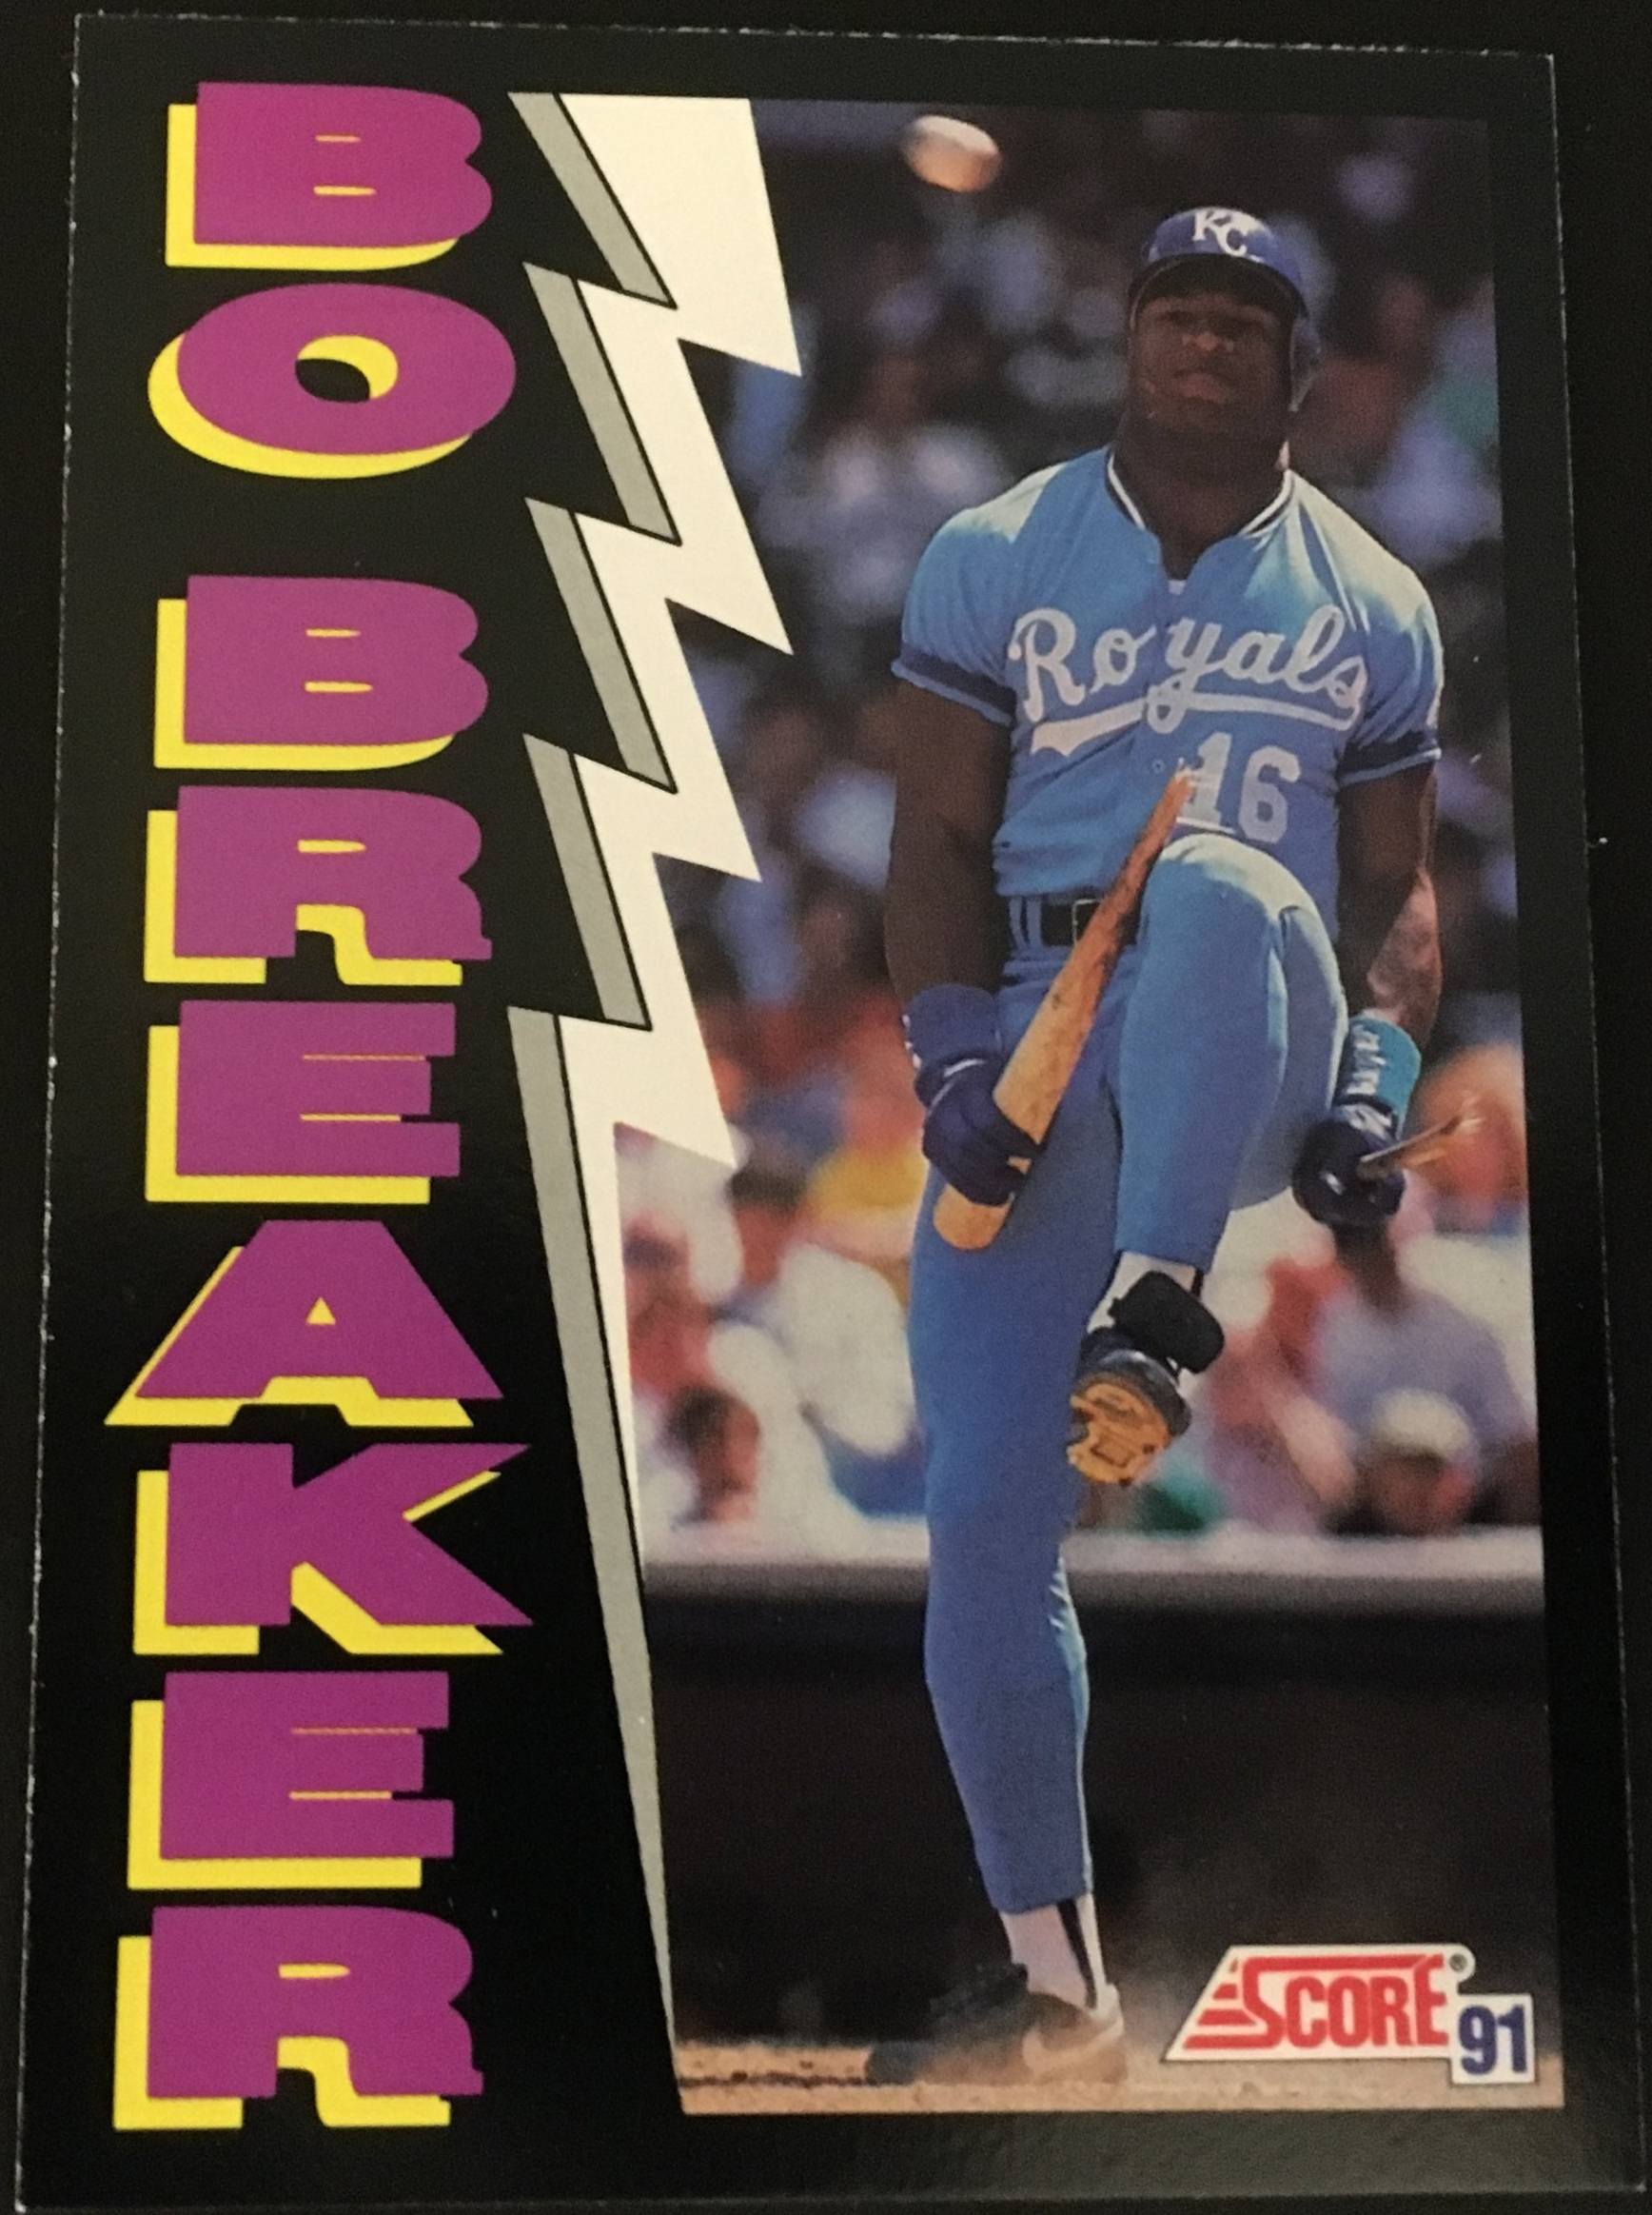 1991-Score-Bo-Jackson.JPG